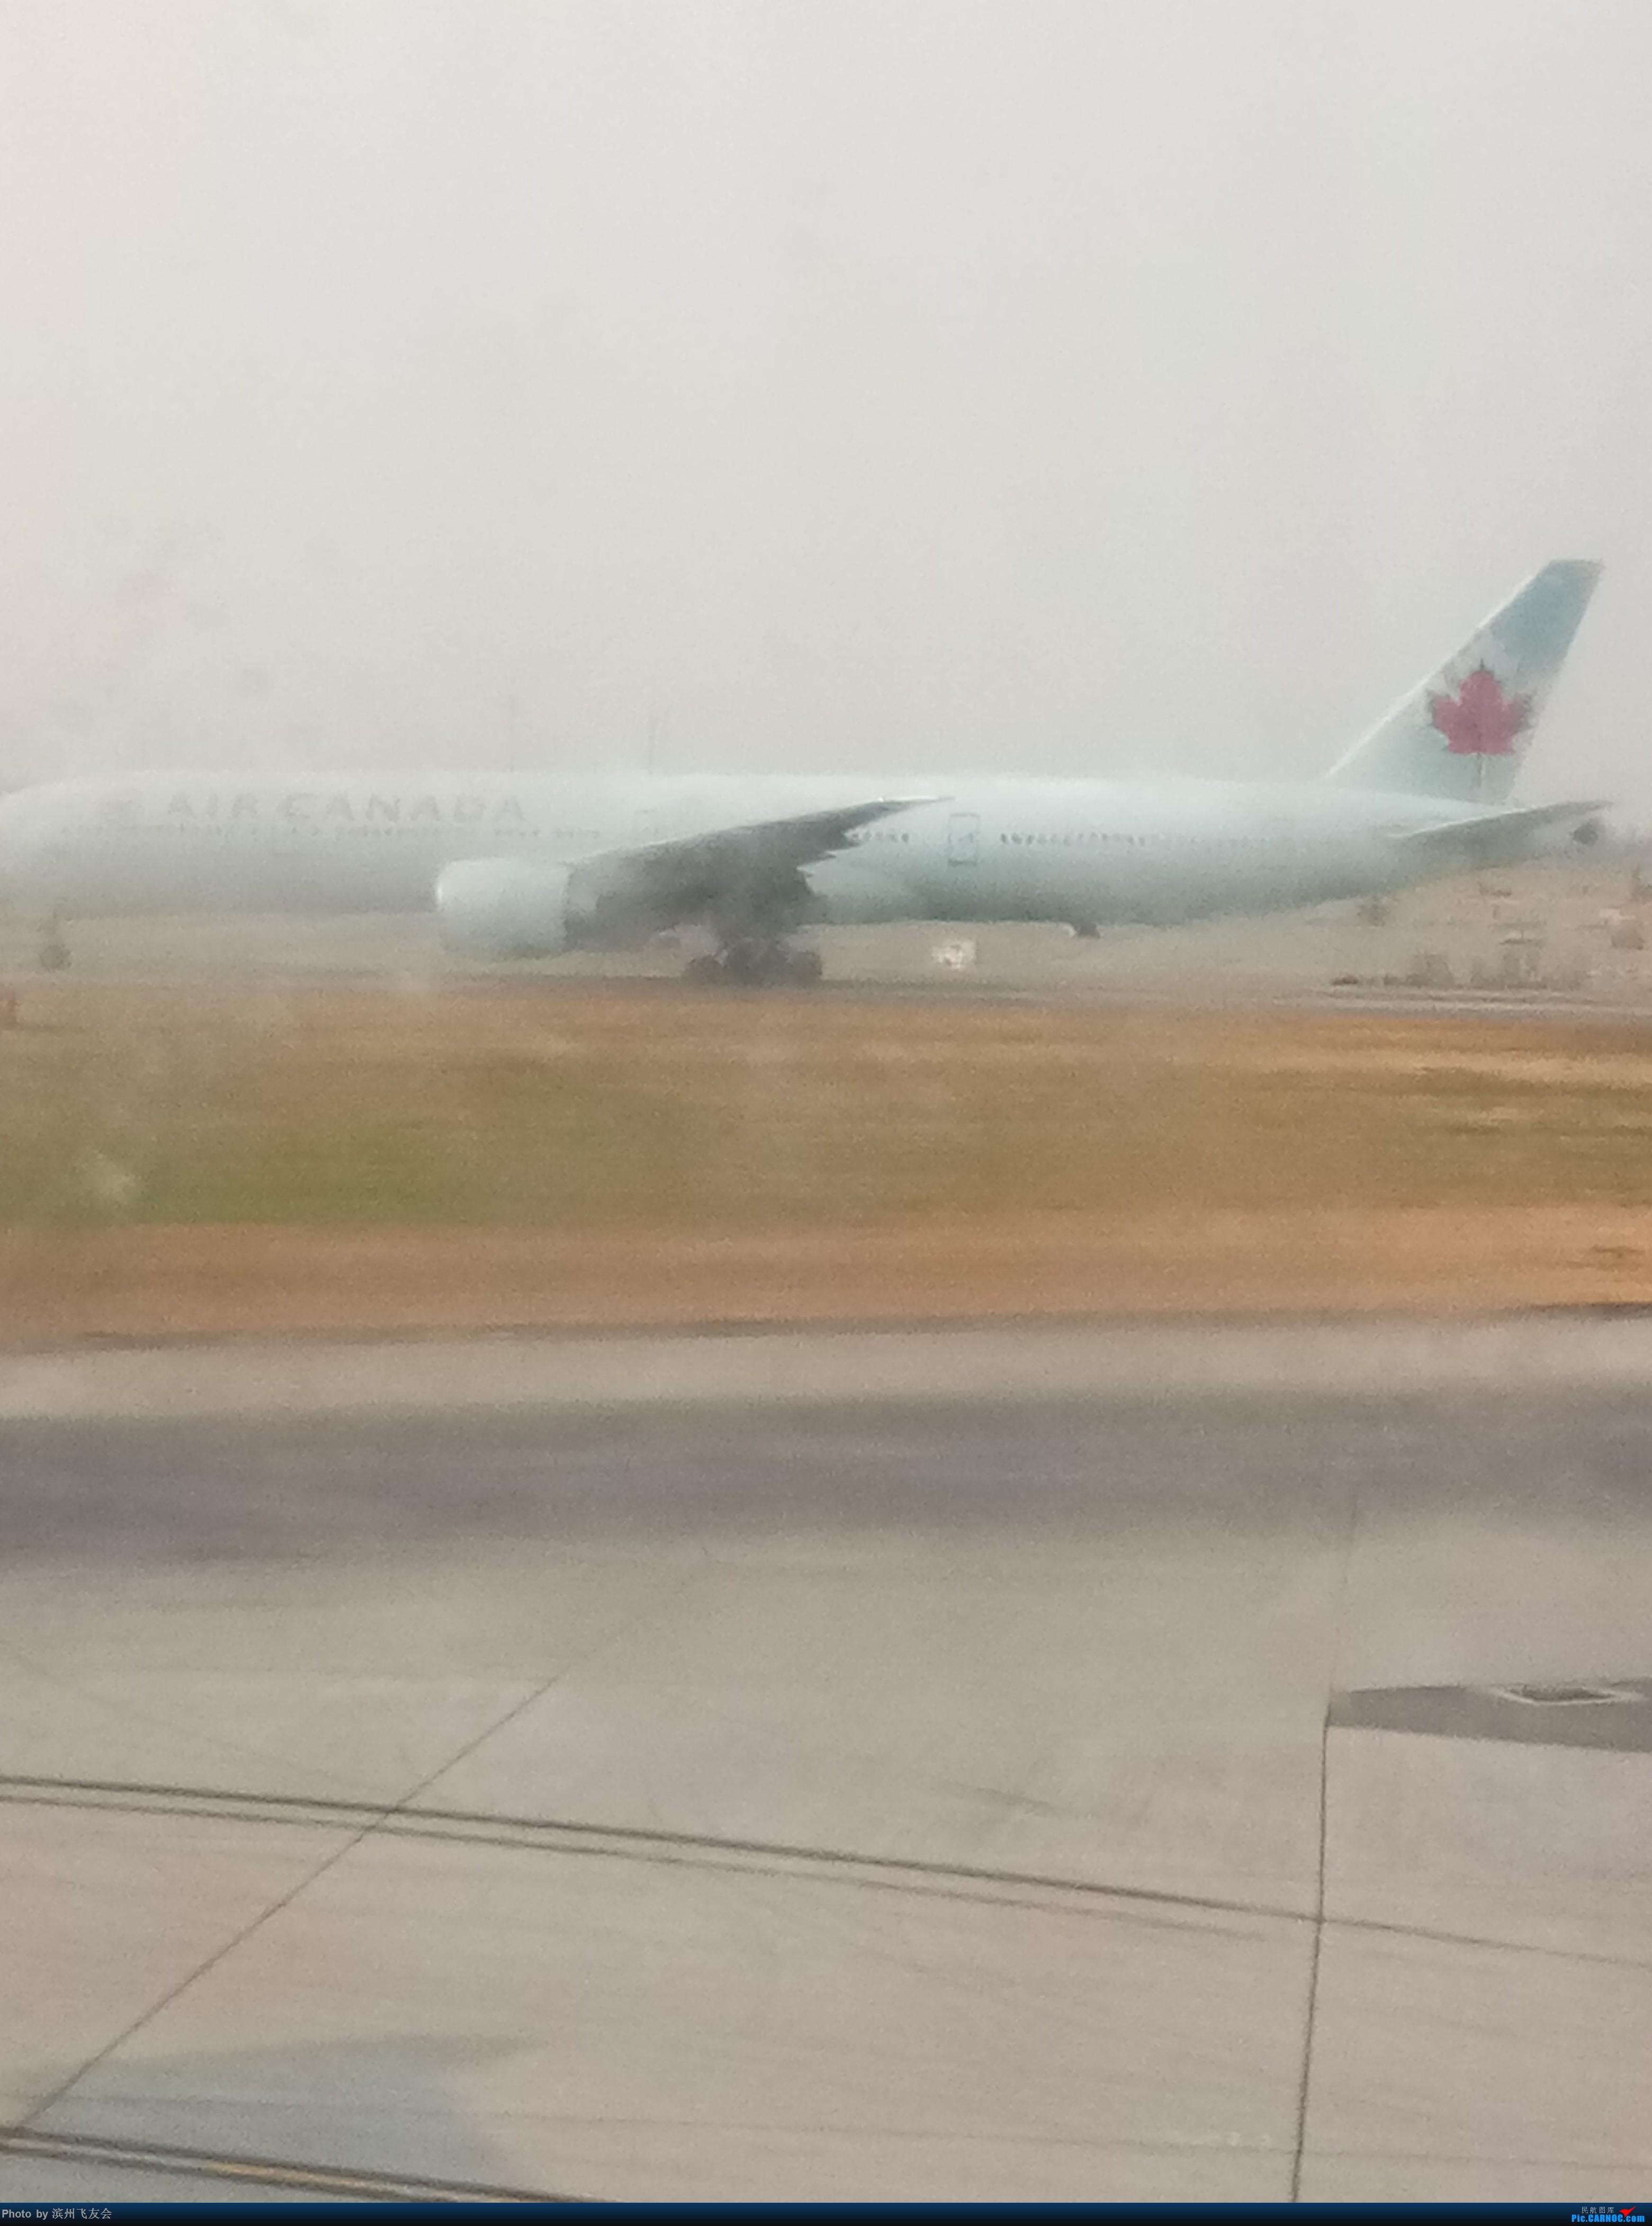 Re:[原创]逐梦路上――带你见识一个不一样的温哥华~ BOEING 777-300ER  加拿大温哥华机场